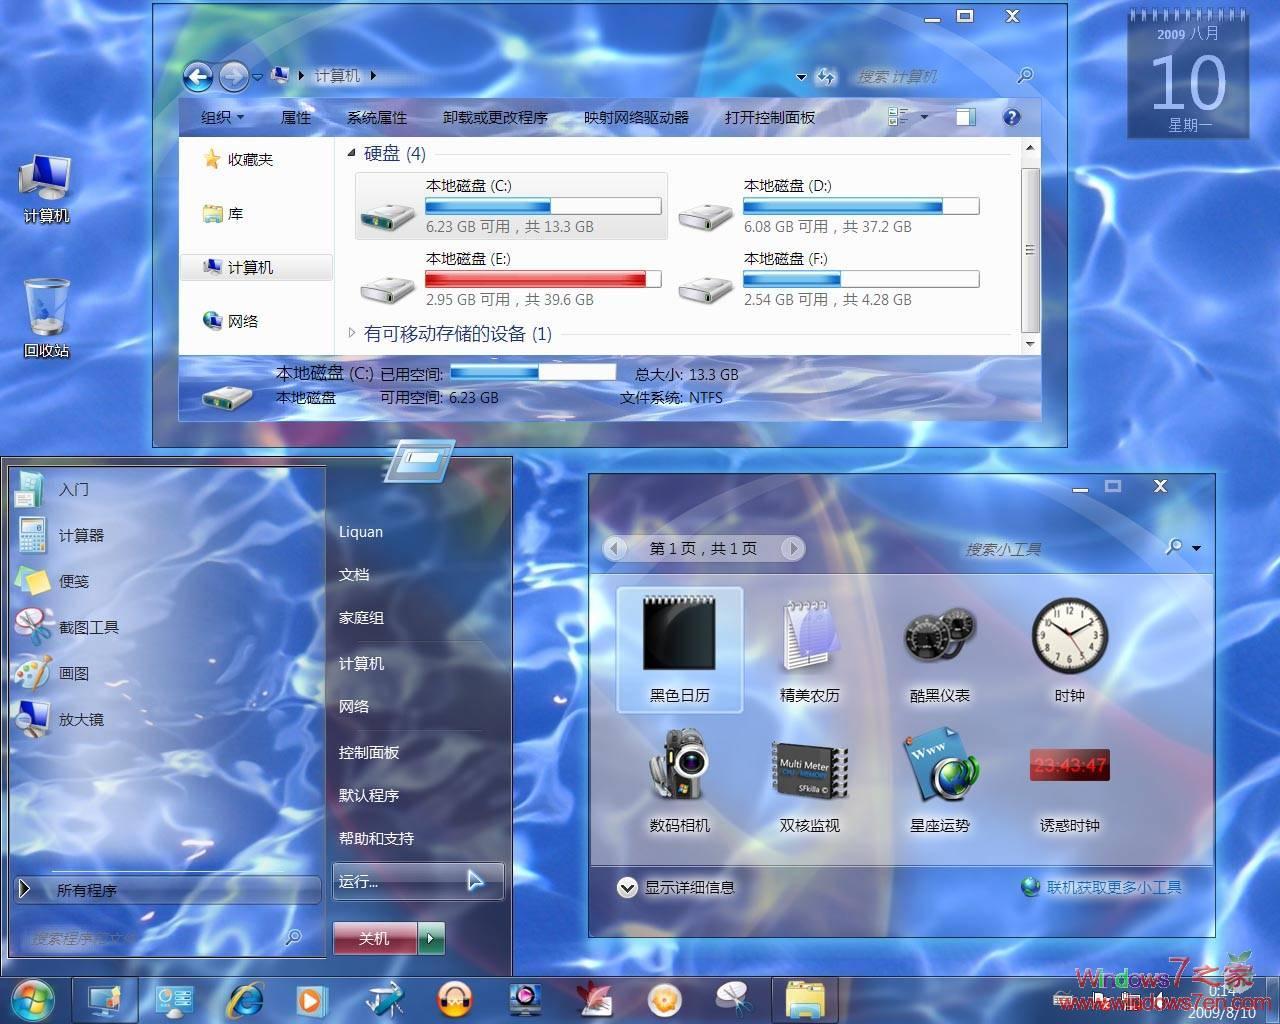 Windows7五颜六色系列主题之蓝色主题:波蓝壮阔